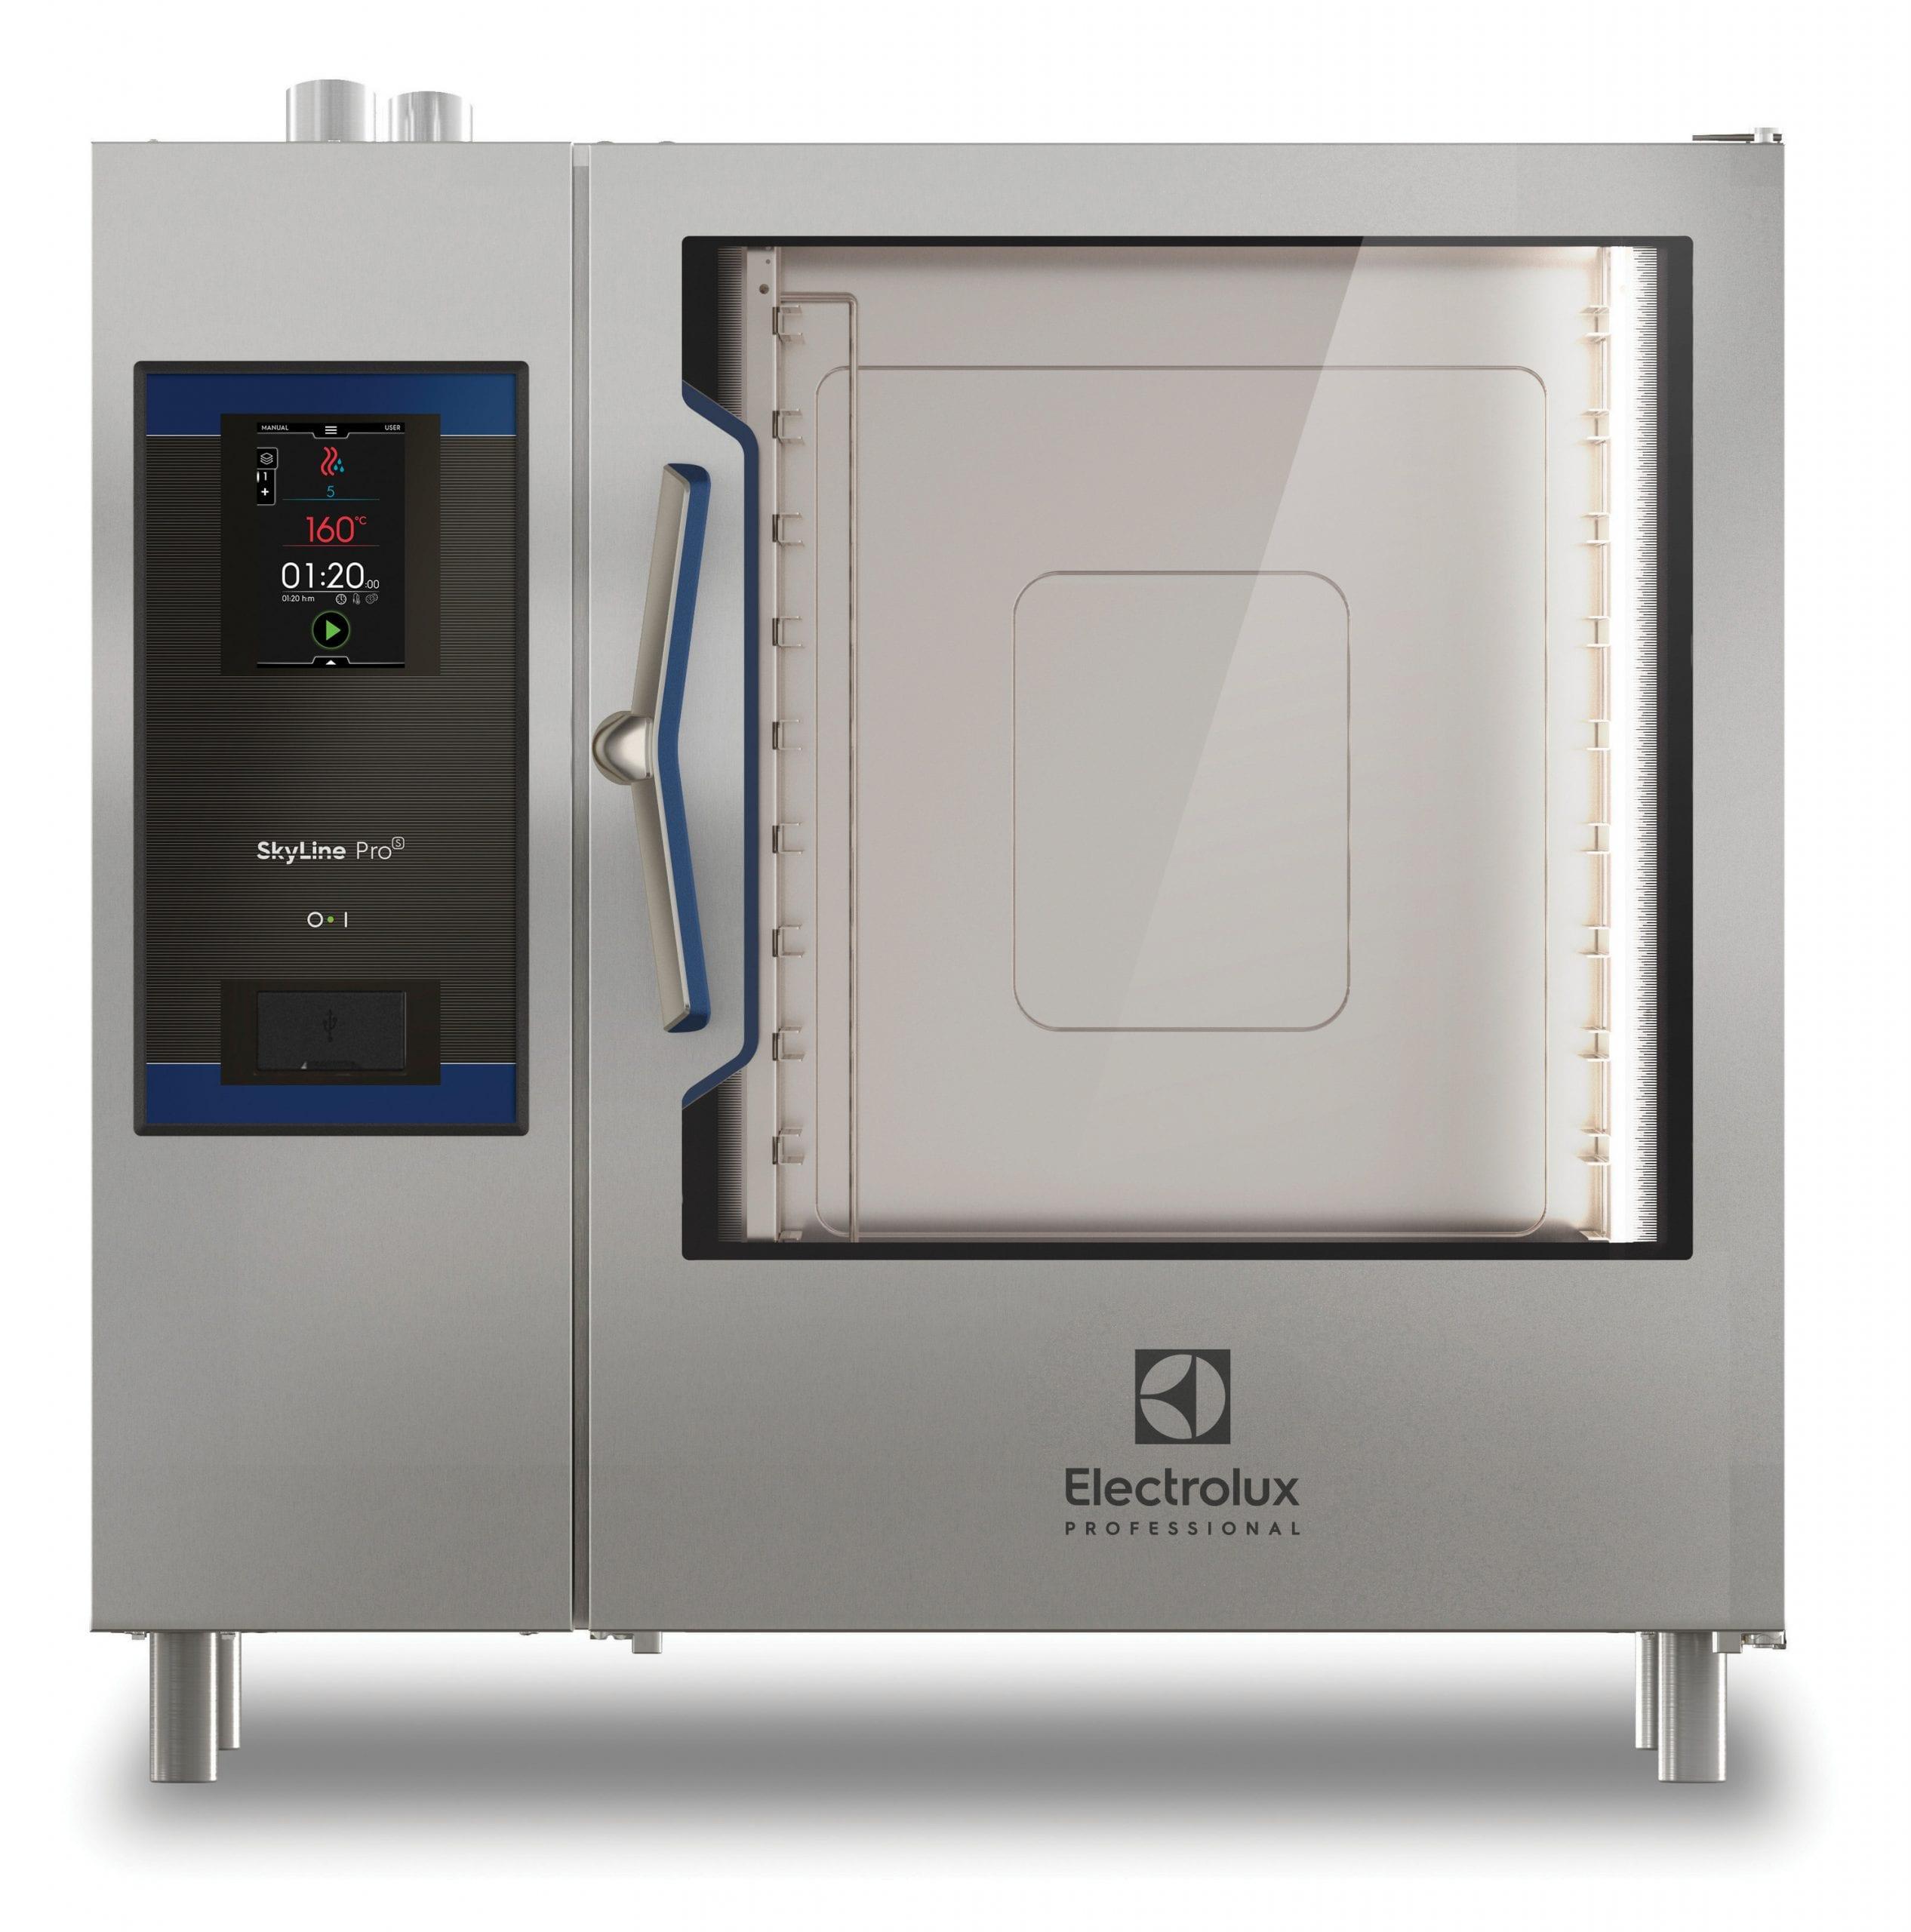 Combi Oven Skyline Pro 6 GN 1/1 Image